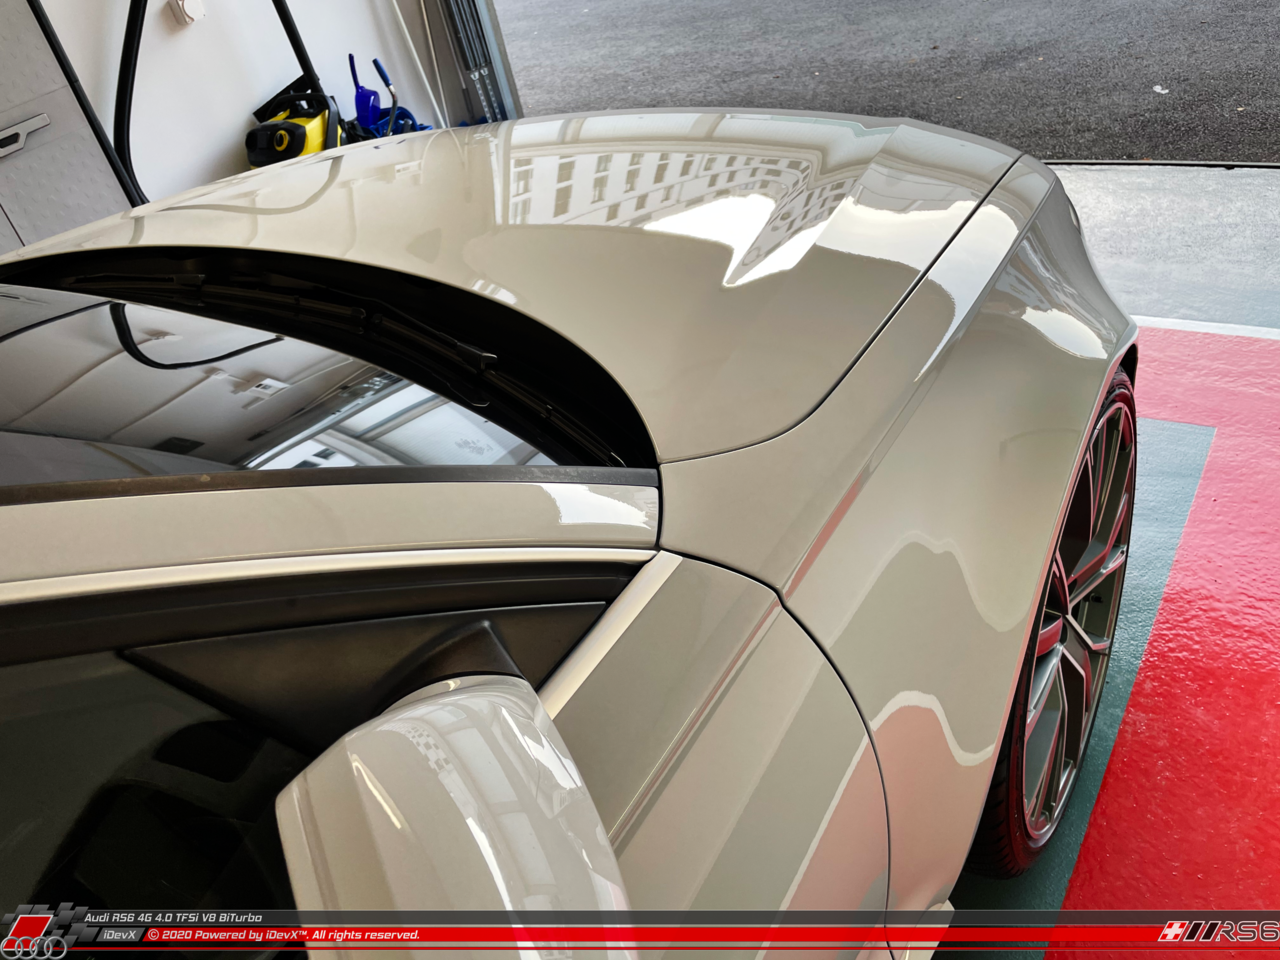 19.02.2021_Audi-RS6_iDevX_013.png